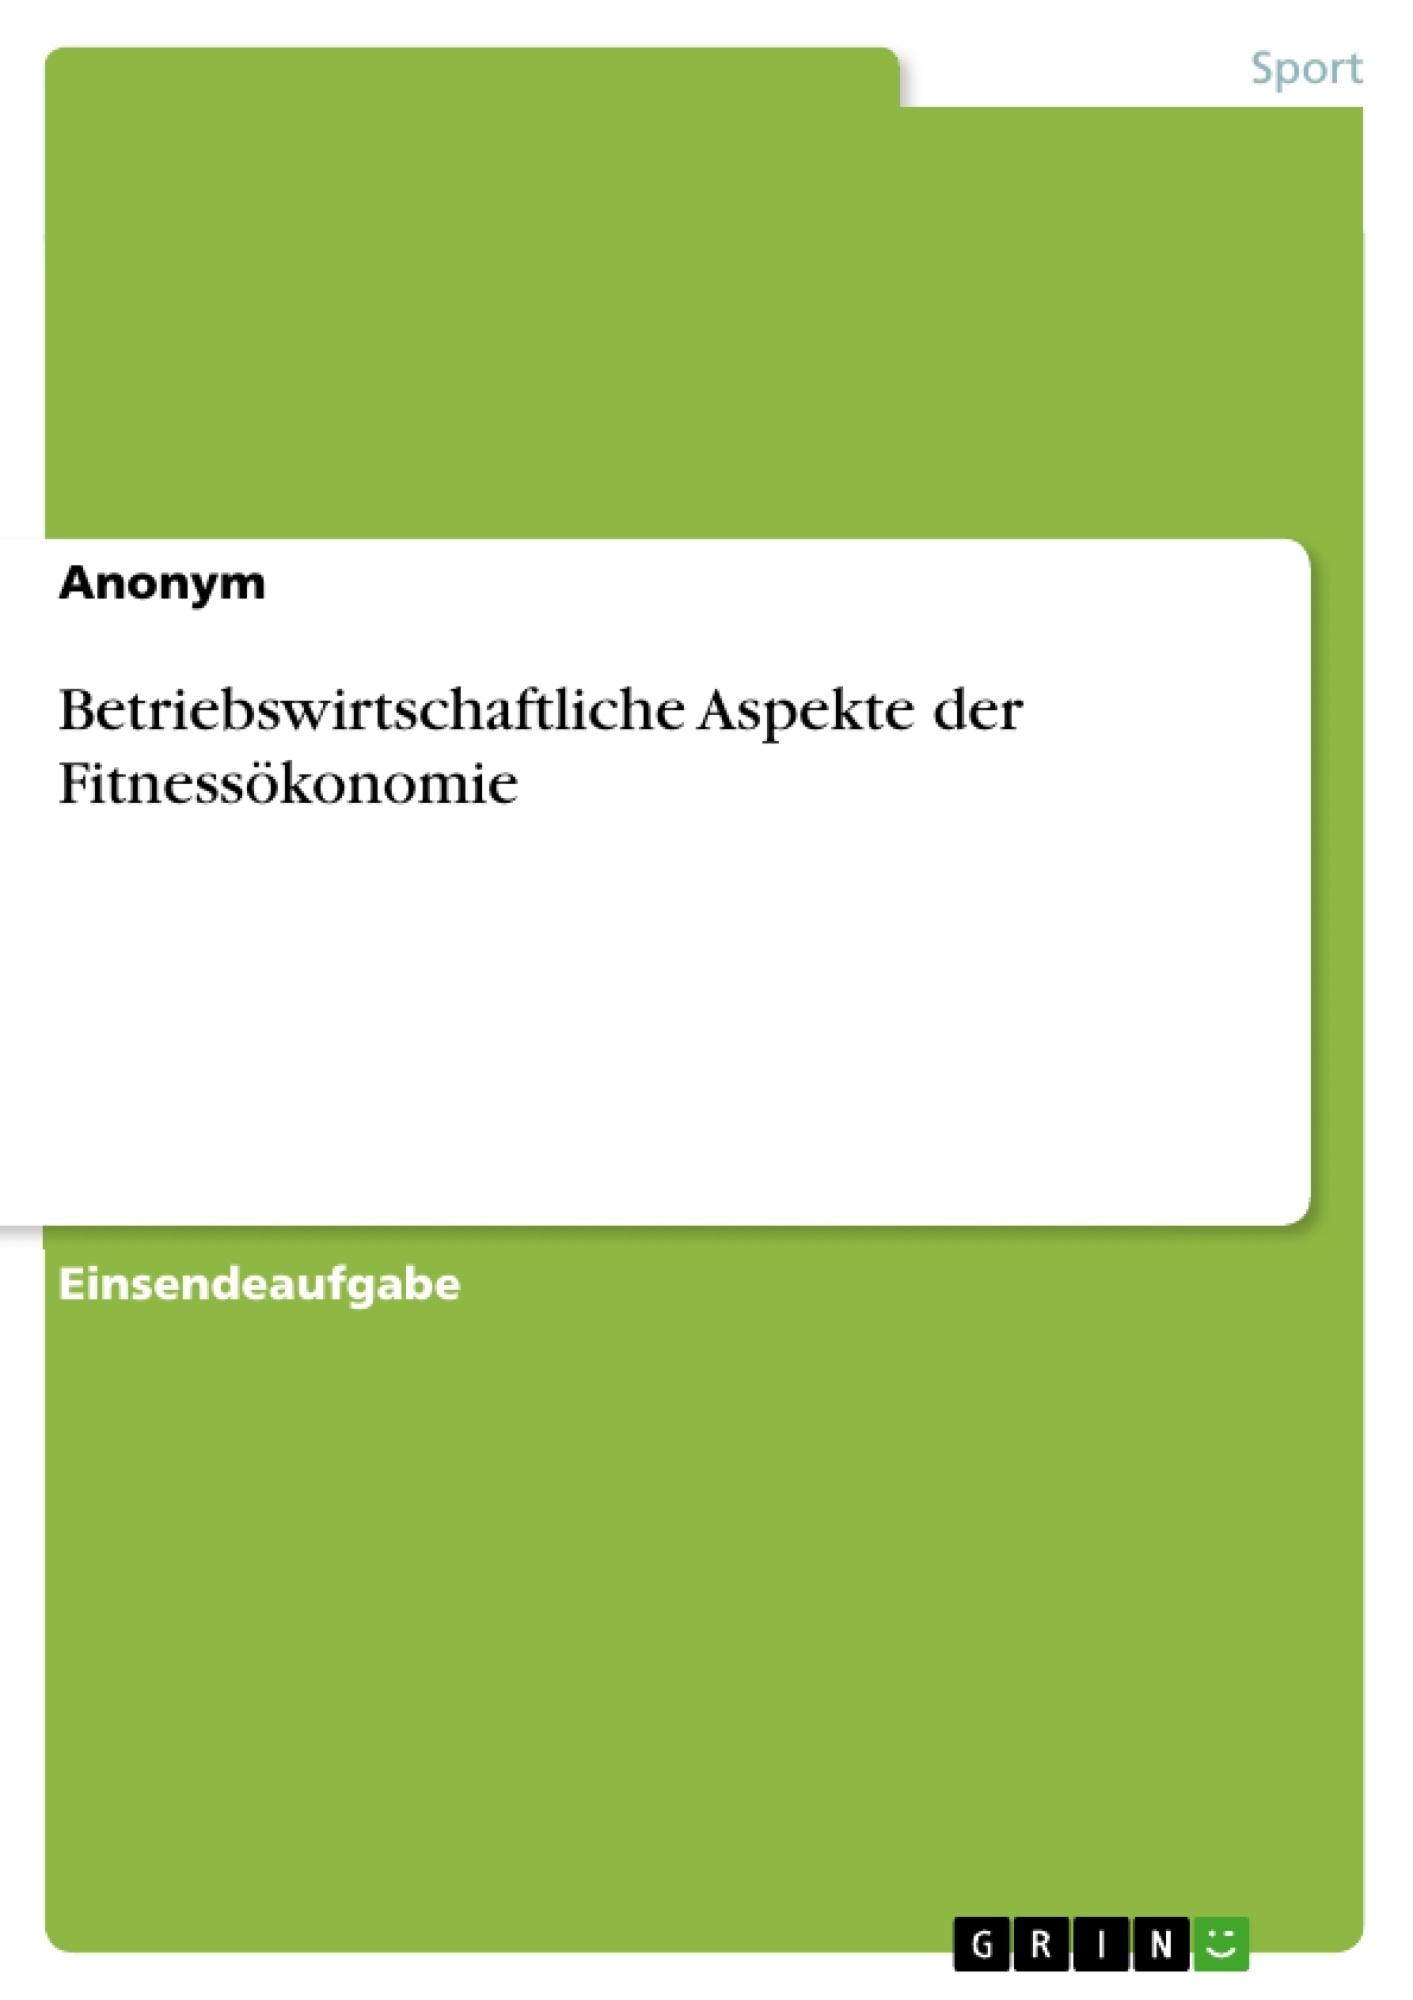 bachelor thesis fitnessökonomie themen